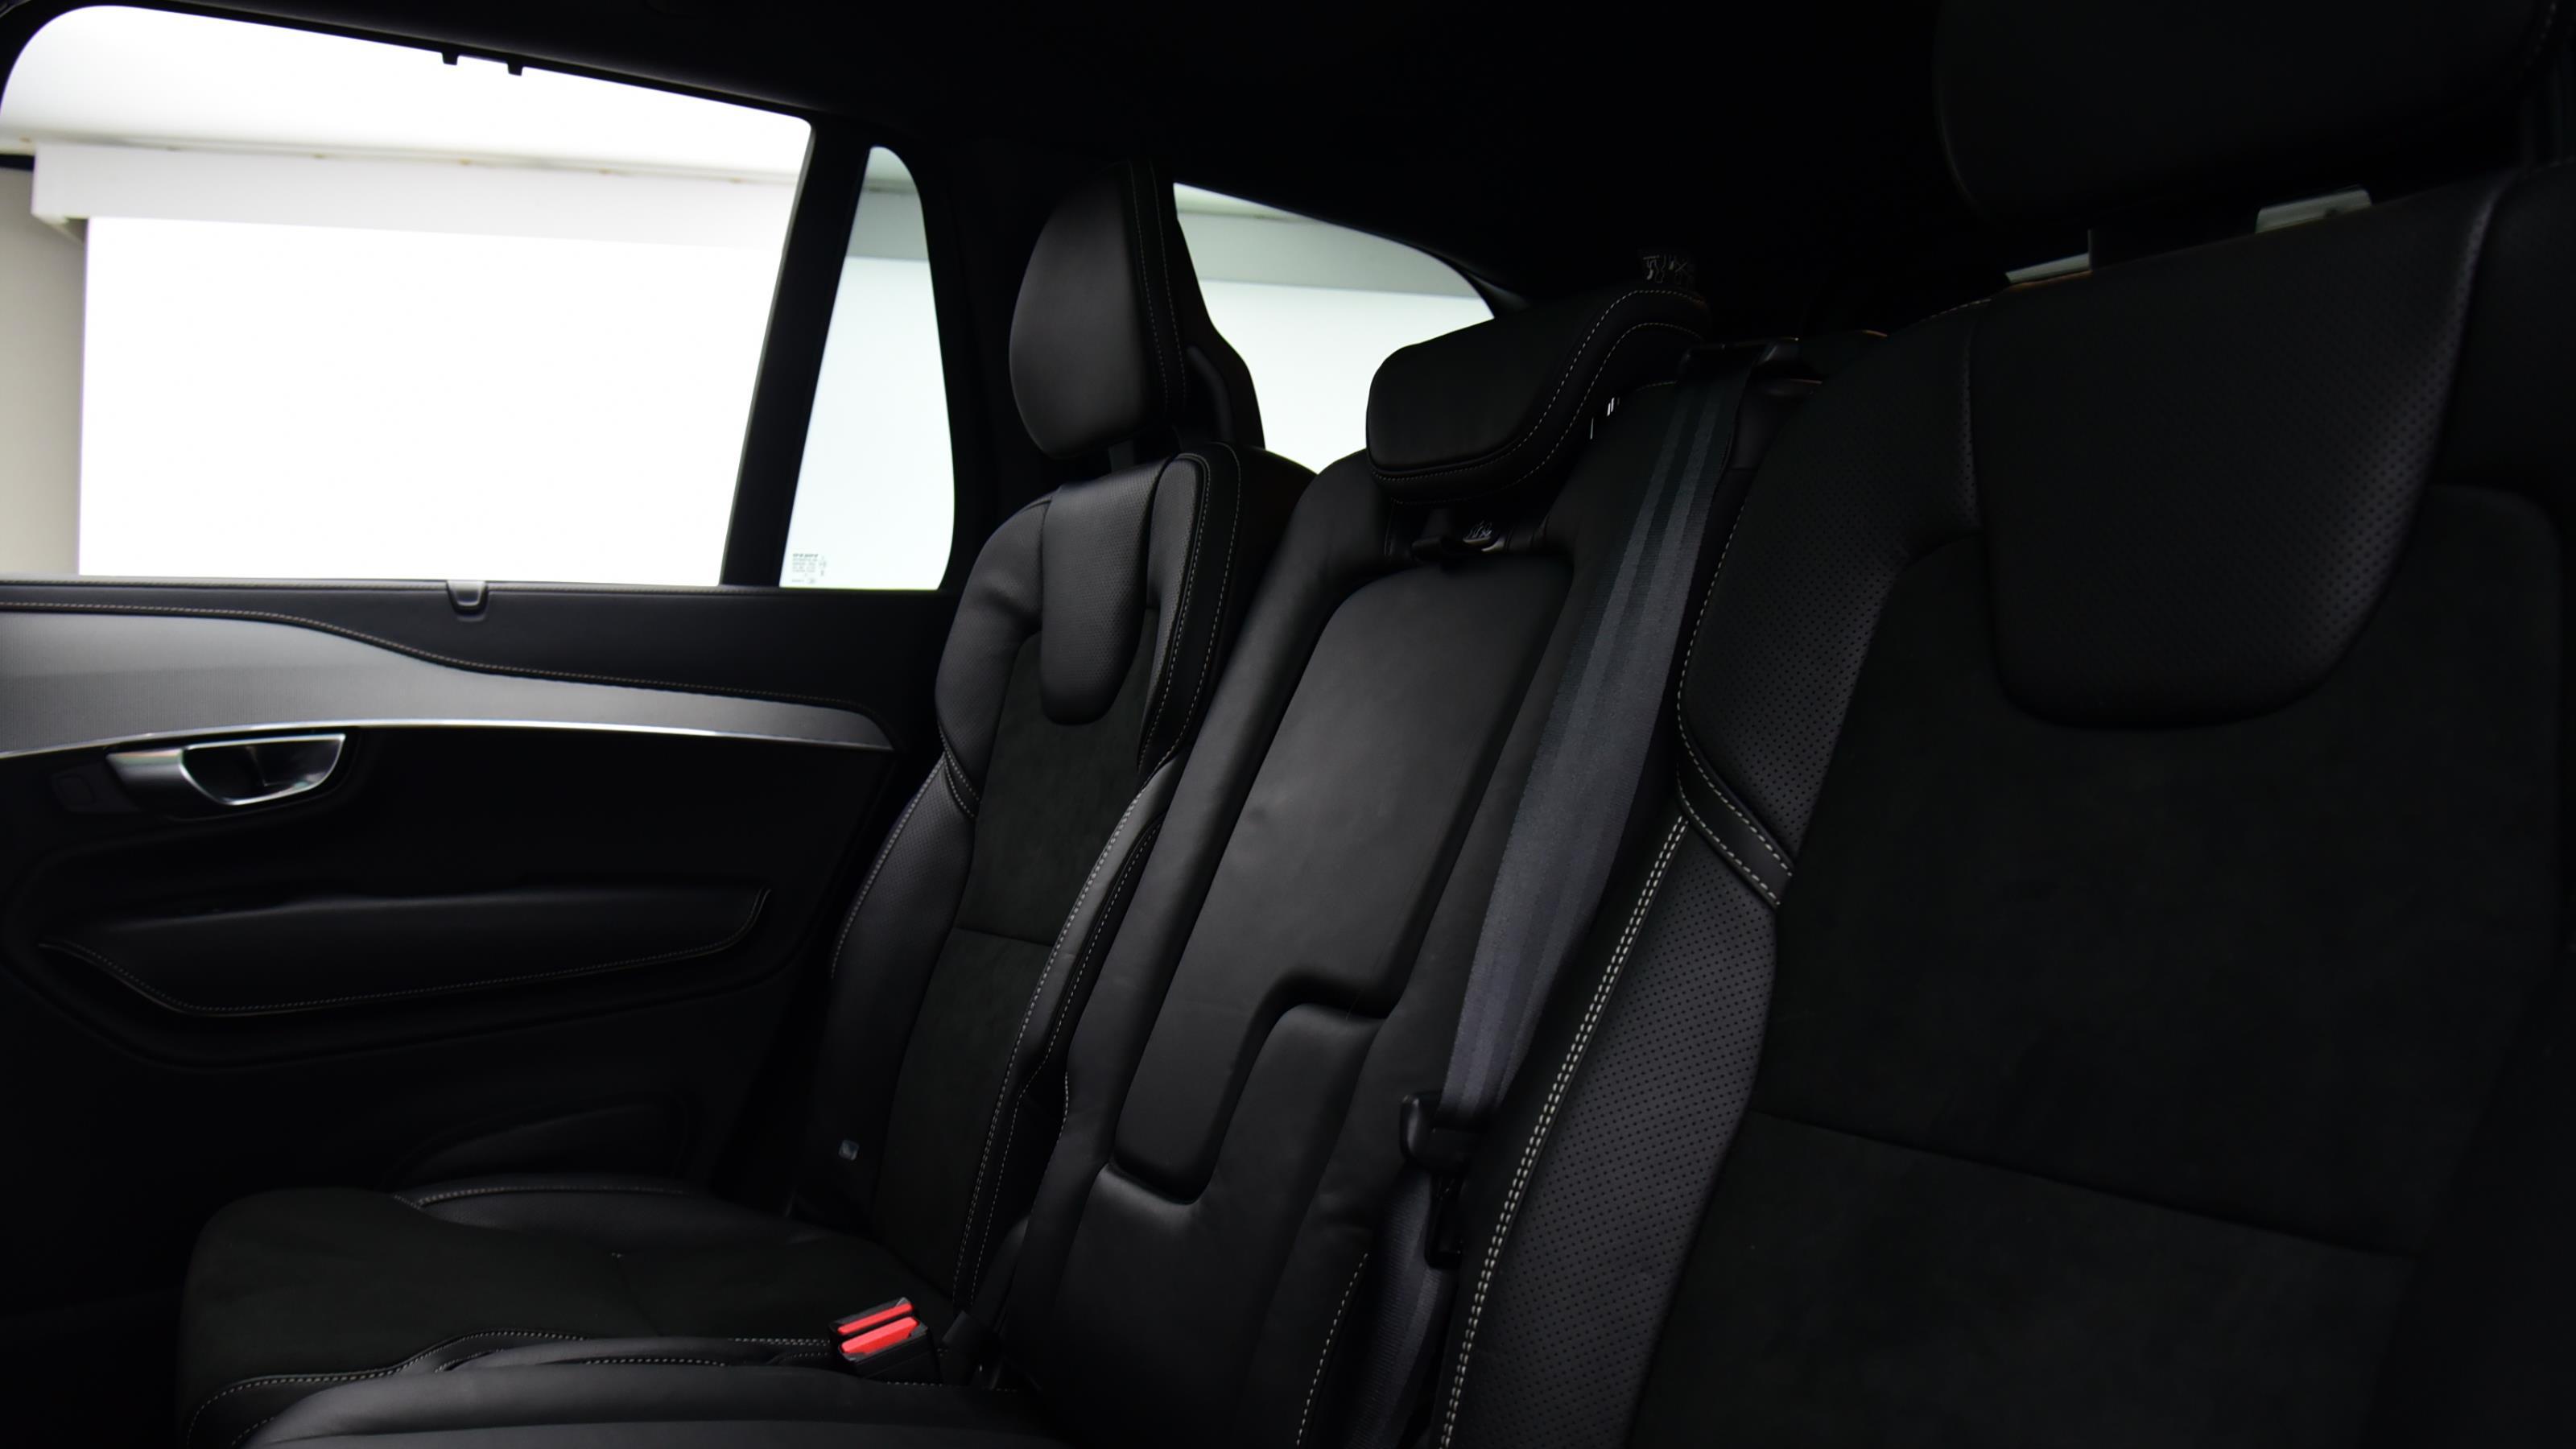 Used 2019 Volvo XC90 2.0 T8 [390] Hybrid R DESIGN 5dr AWD Gtron GREY at Saxton4x4